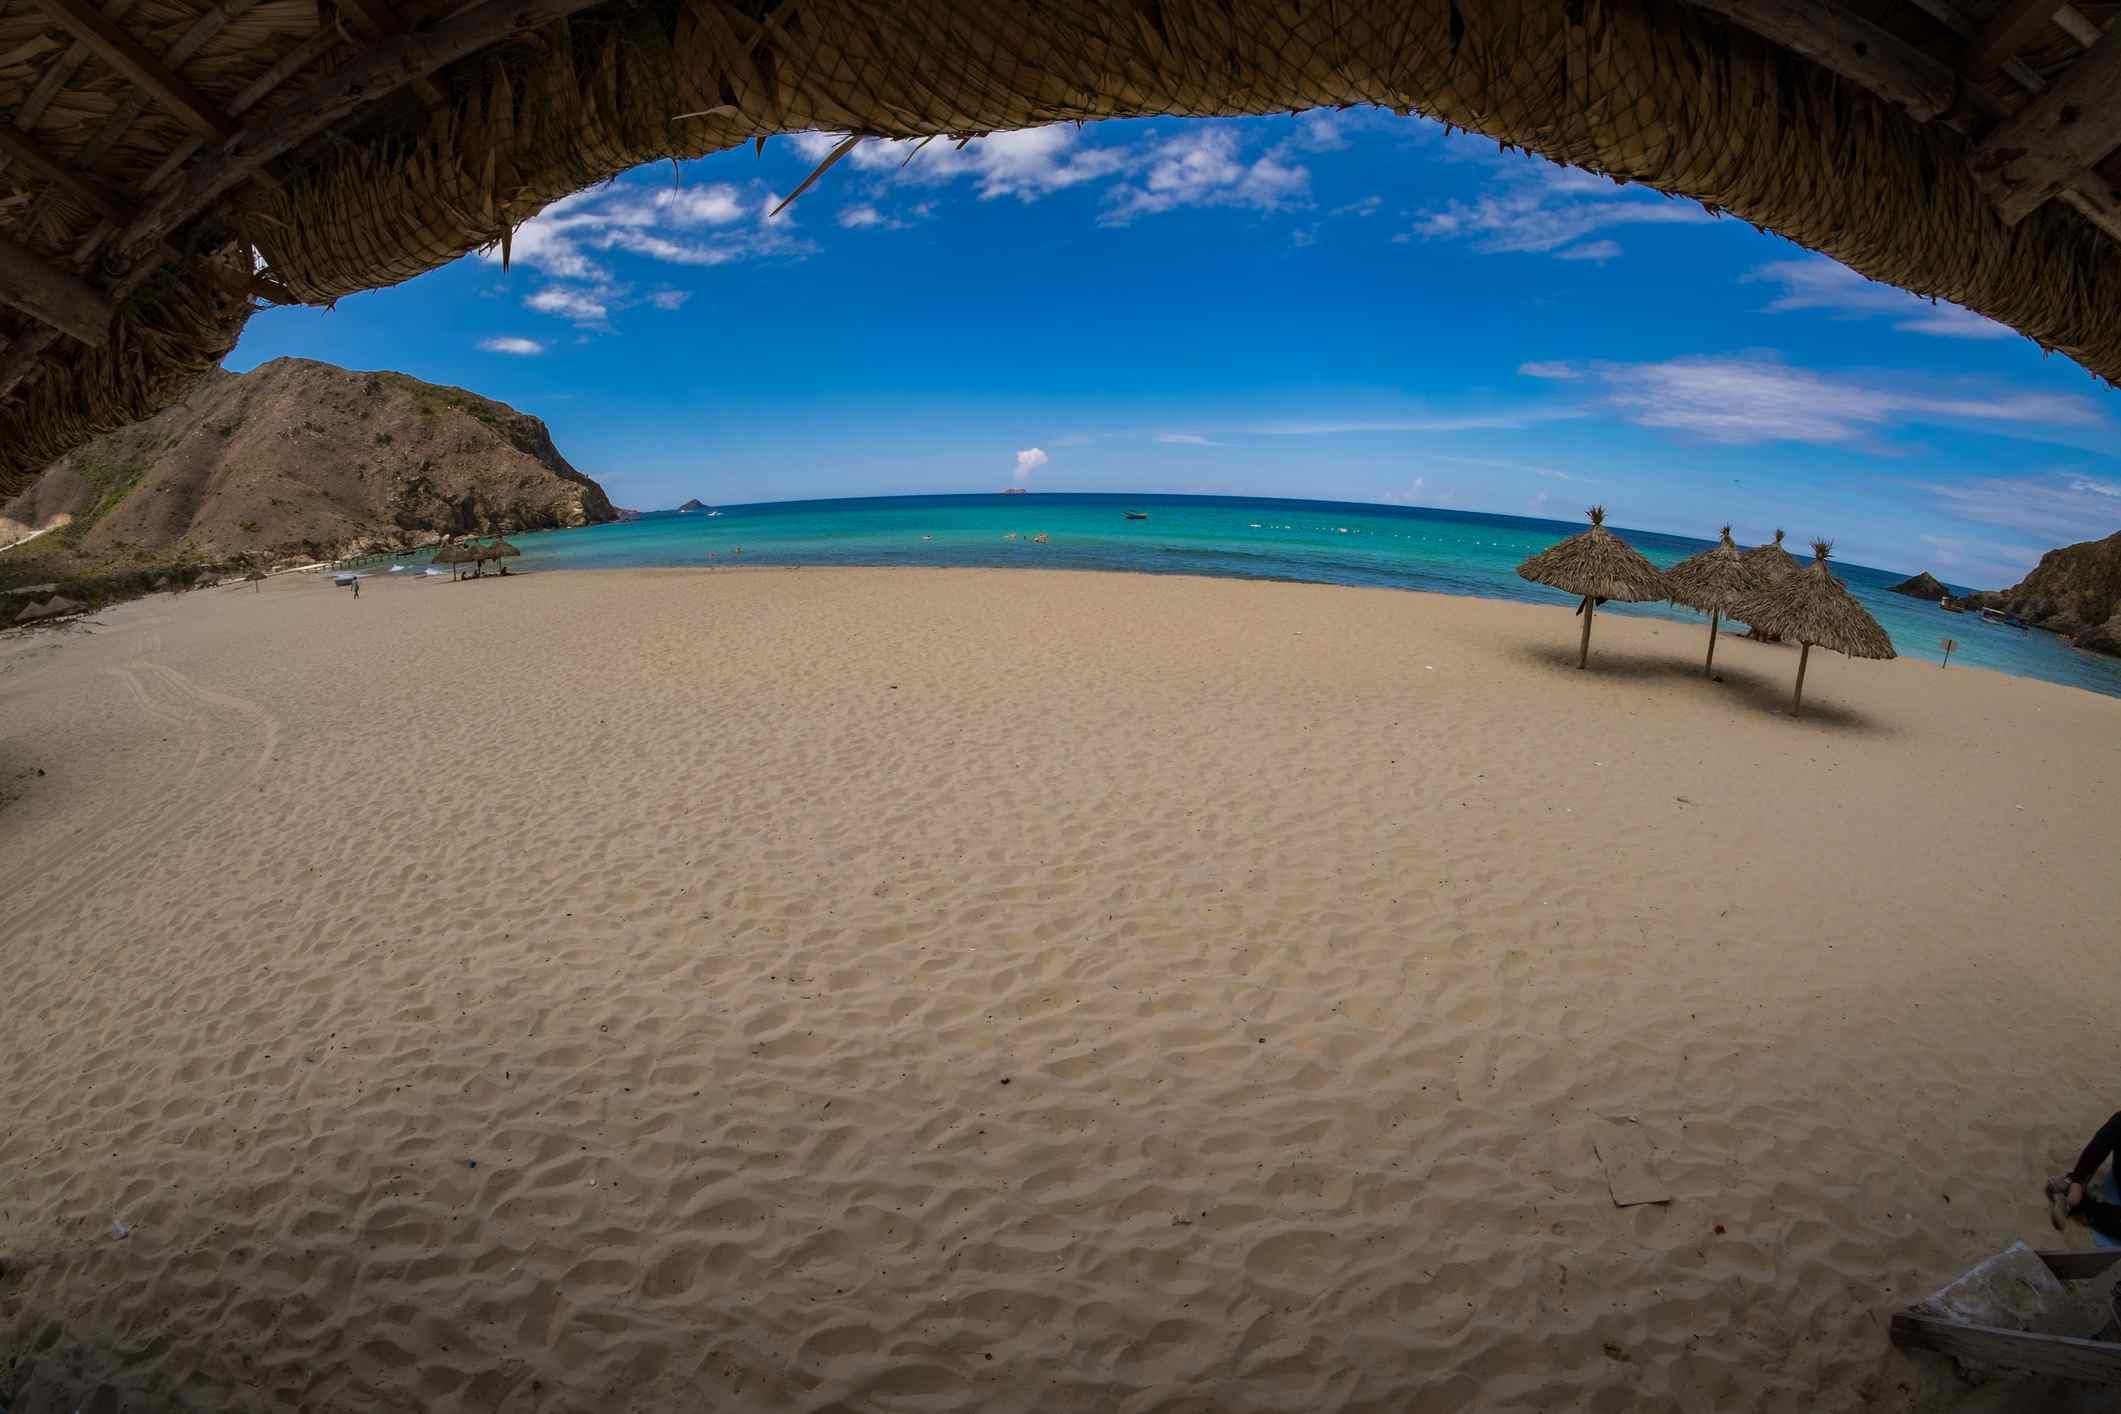 Ky Co Beach, Vietnam